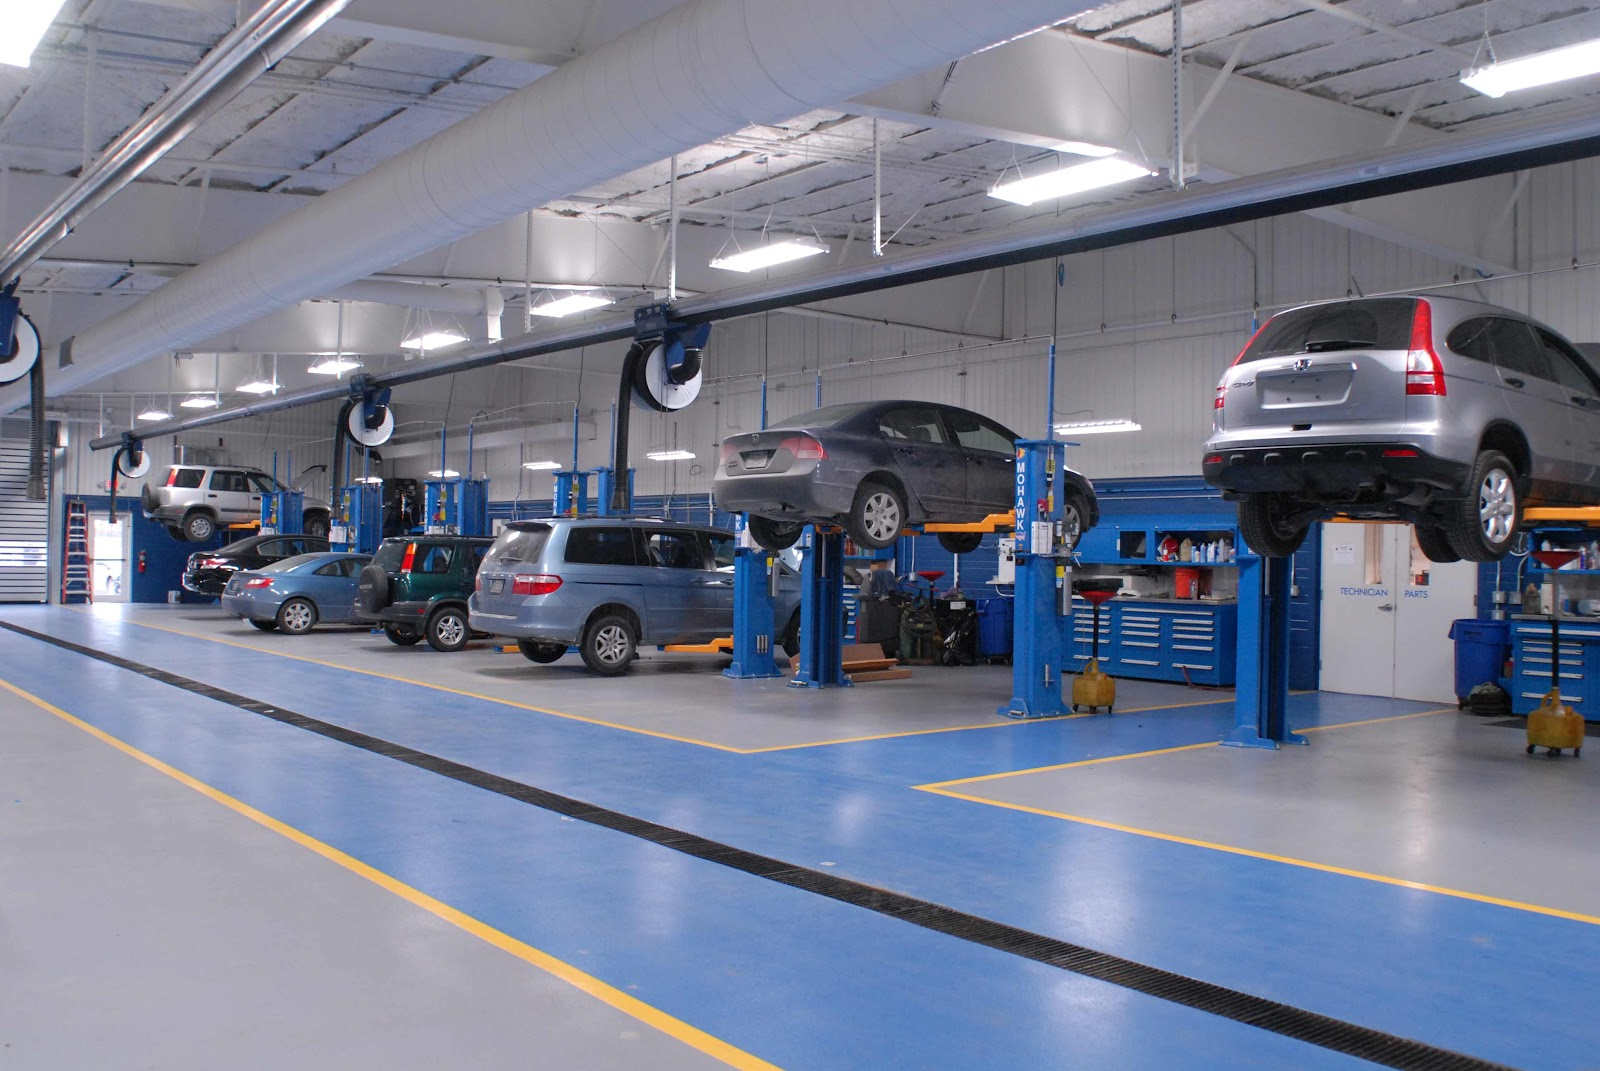 Honda Carland Service >> Memorial Day Savings On Service At Honda Carland In Roswell Ga